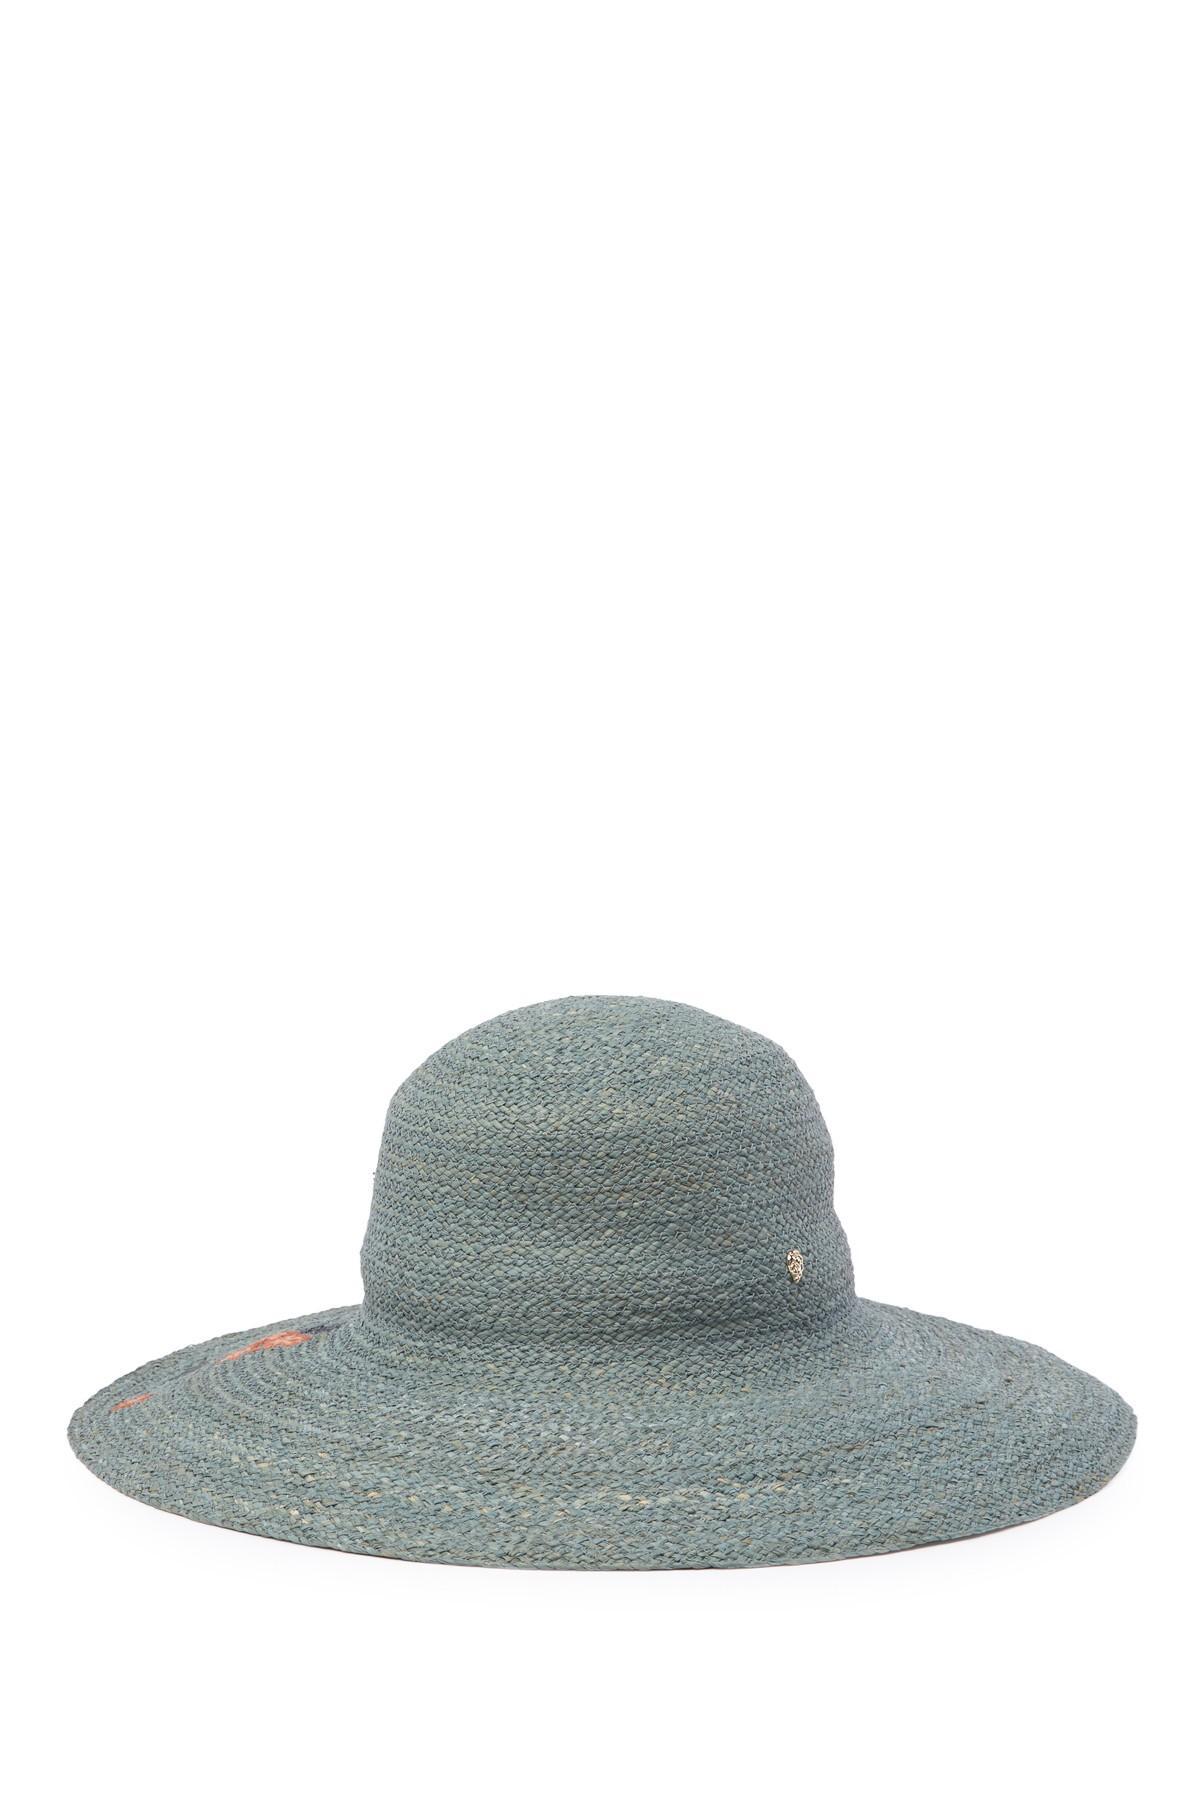 e4e63d4efa66 Helen Kaminski - Gray Jardin Wide Brim Cloche Hat - Lyst. View fullscreen